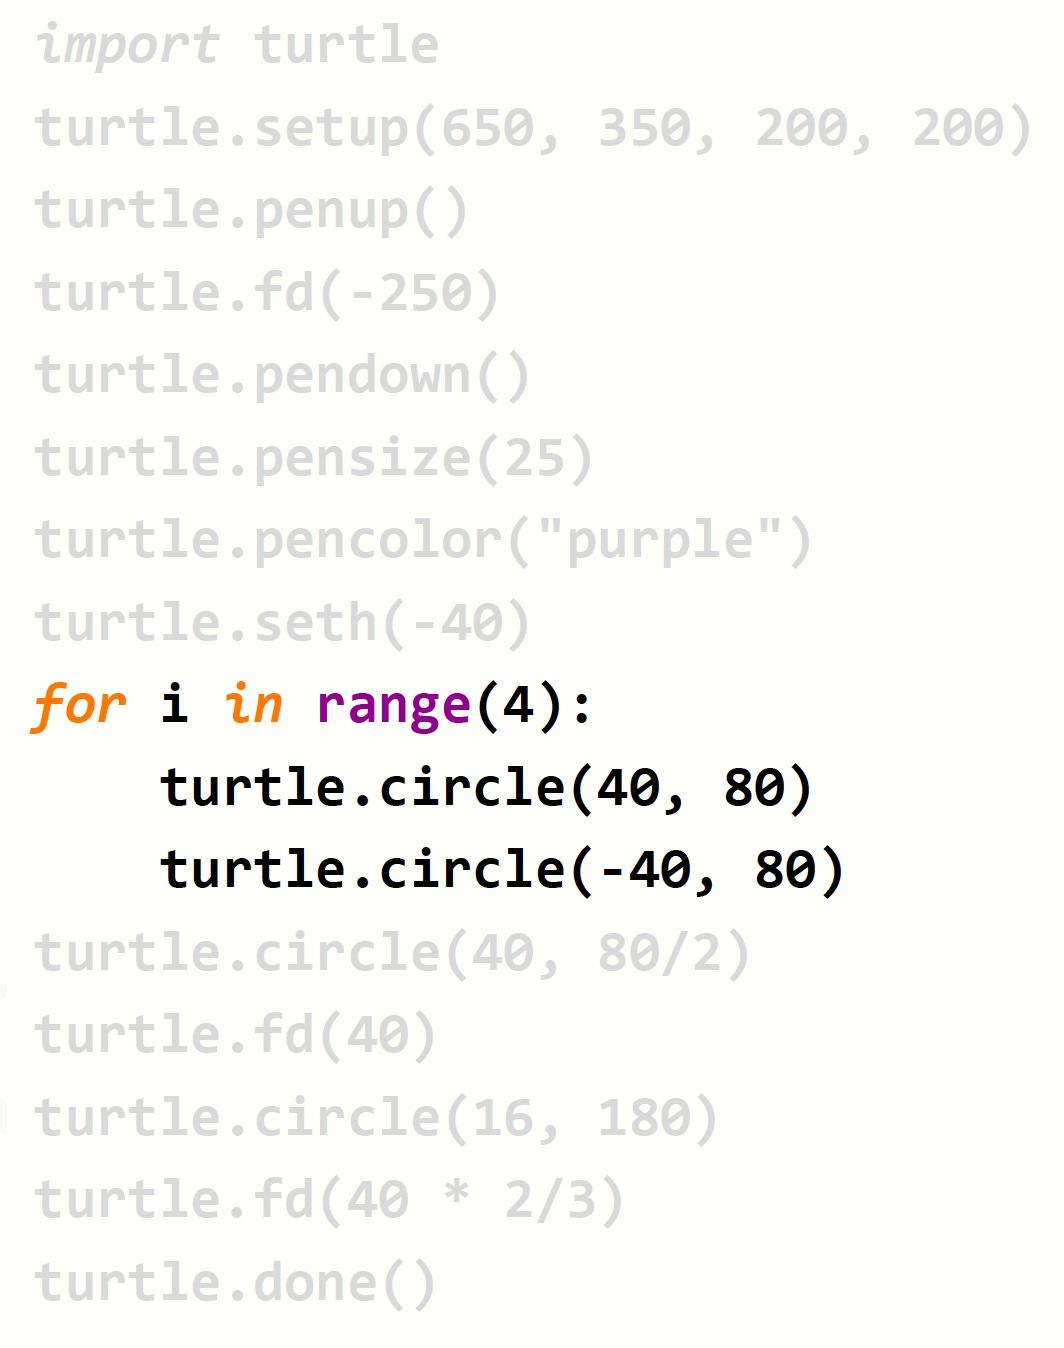 013-turtle程序语法元素分析-10.jpg?x-oss-process=style/watermark